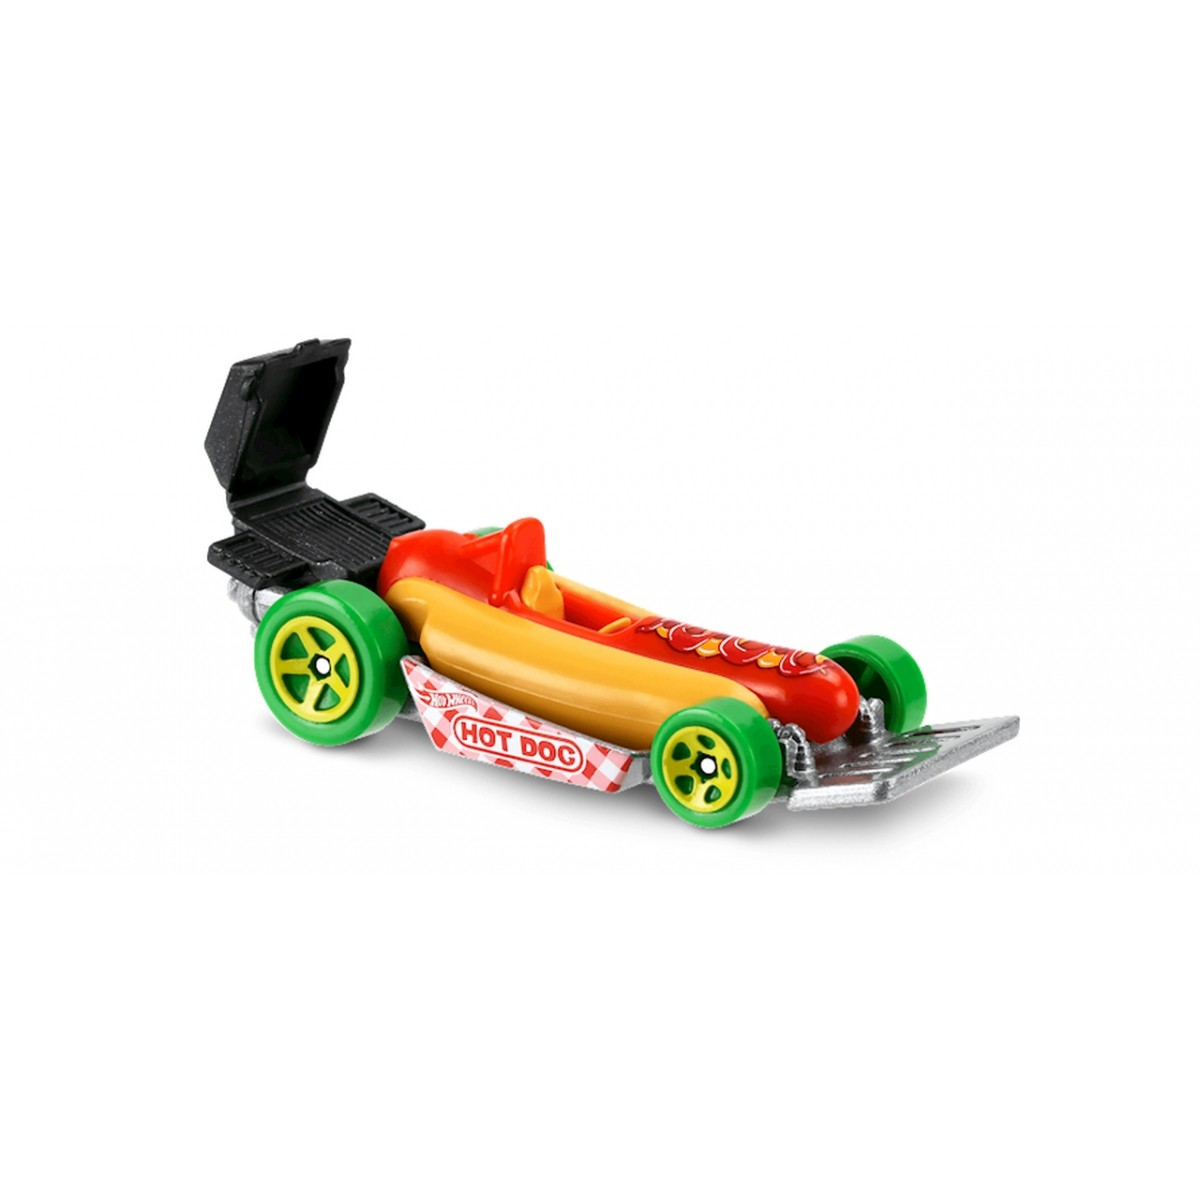 Carrinho Hot Wheels: Street Wiener (Hot Dog)